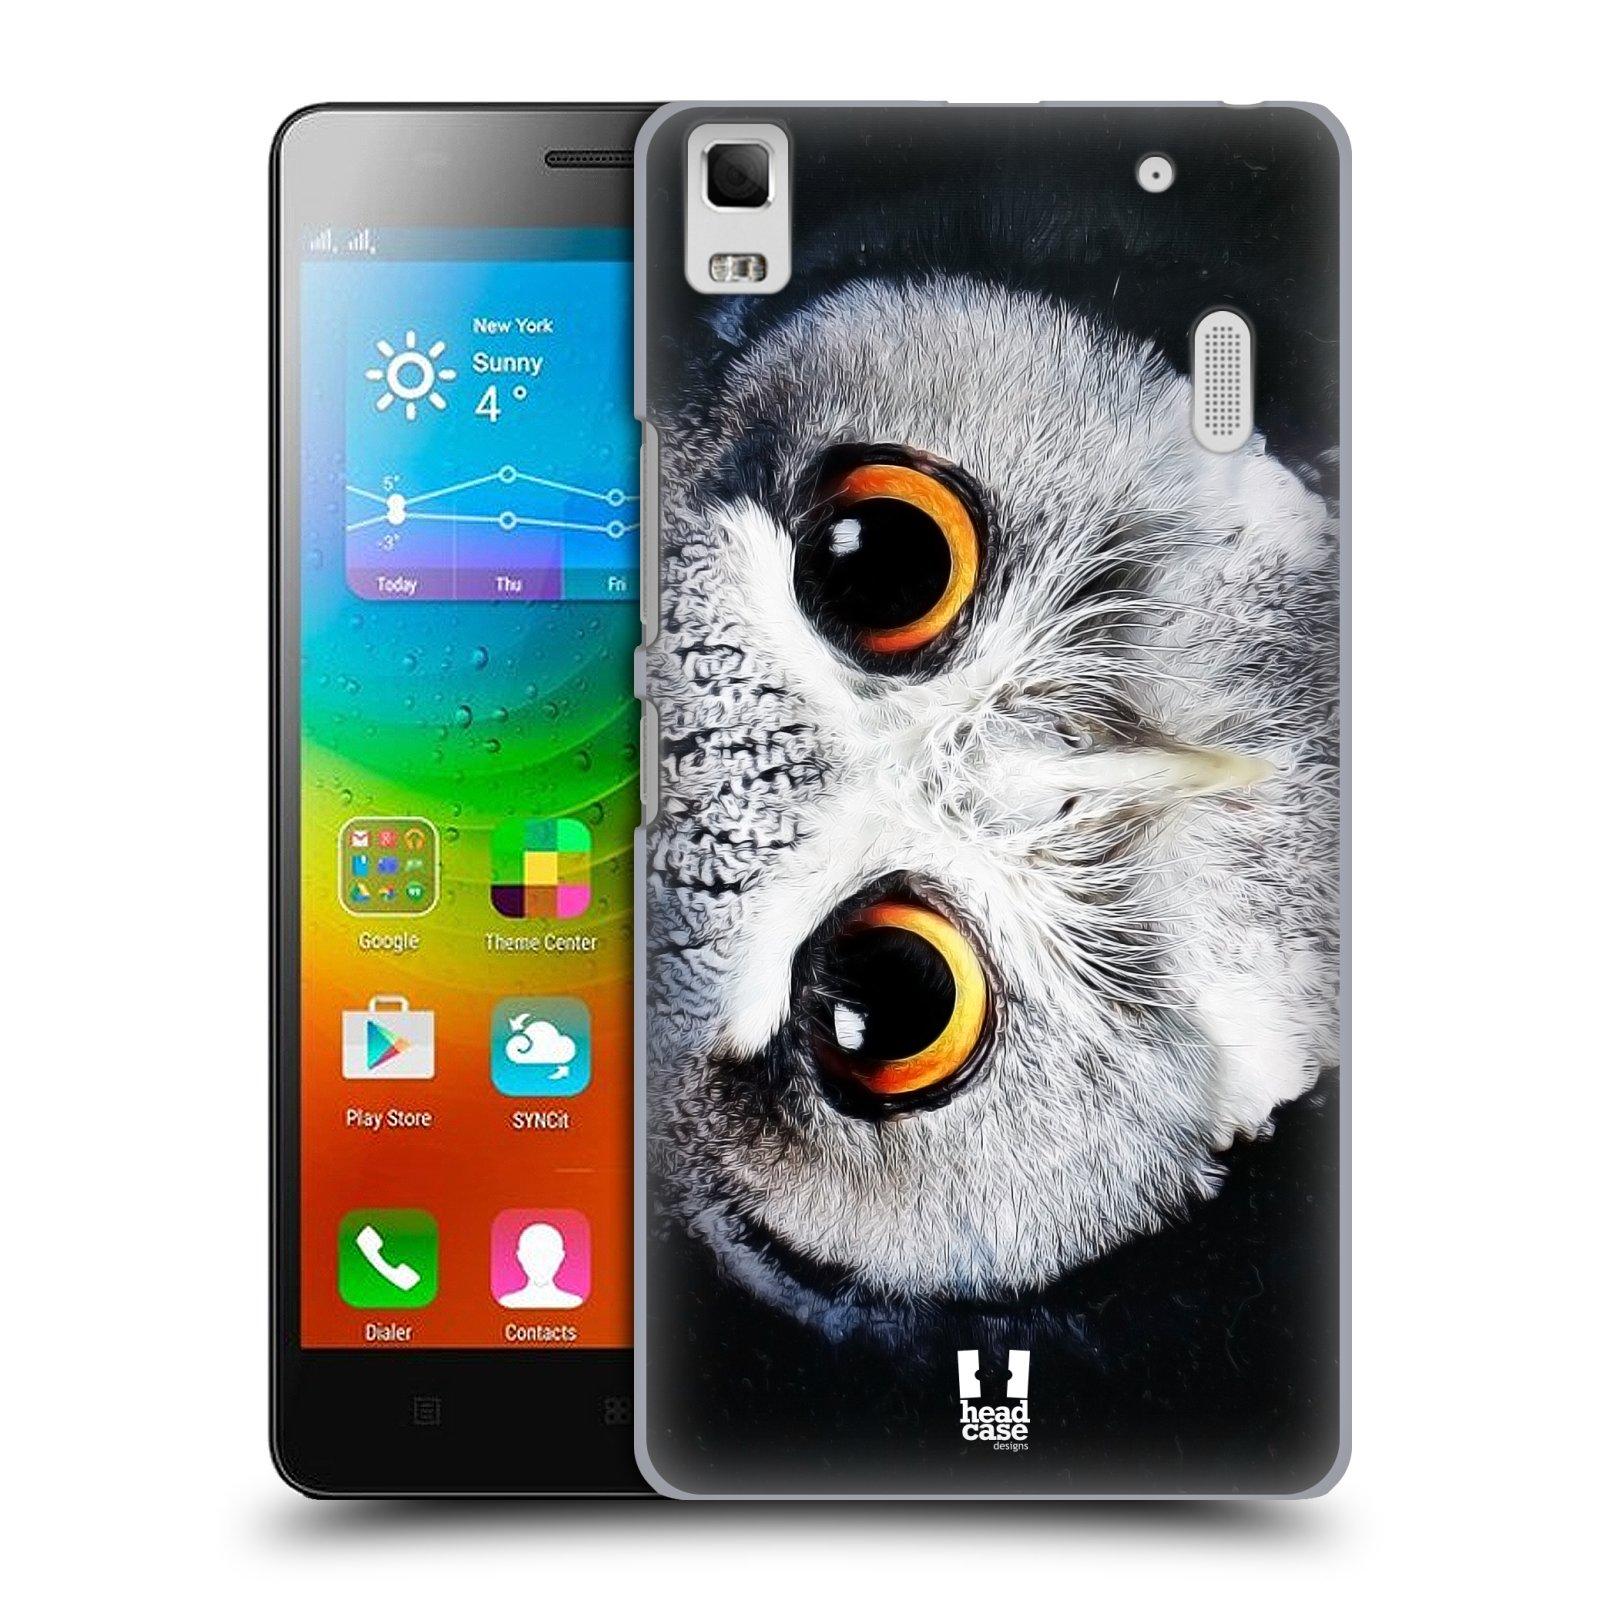 HEAD CASE pevný plastový obal na mobil LENOVO A7000 / A7000 DUAL / K3 NOTE vzor Zvířecí tváře sova